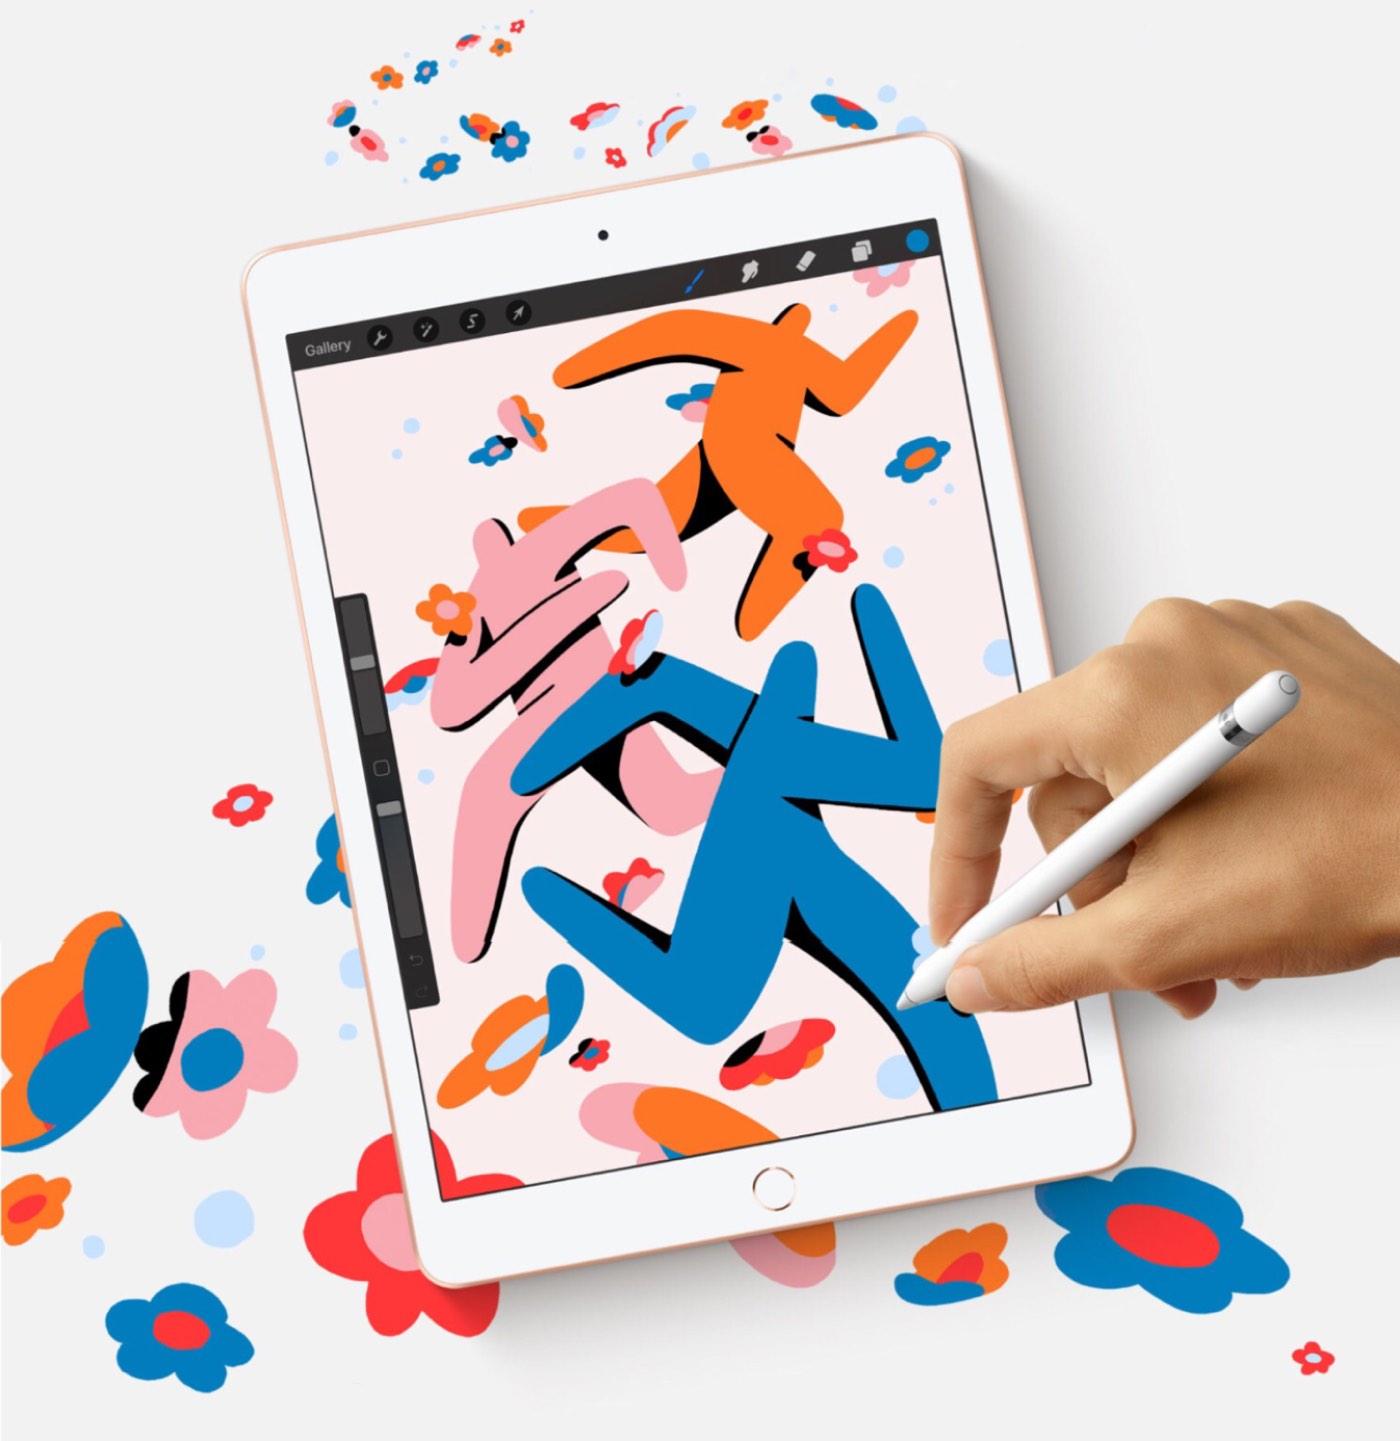 apple-ipad-2020-8th-generation-3